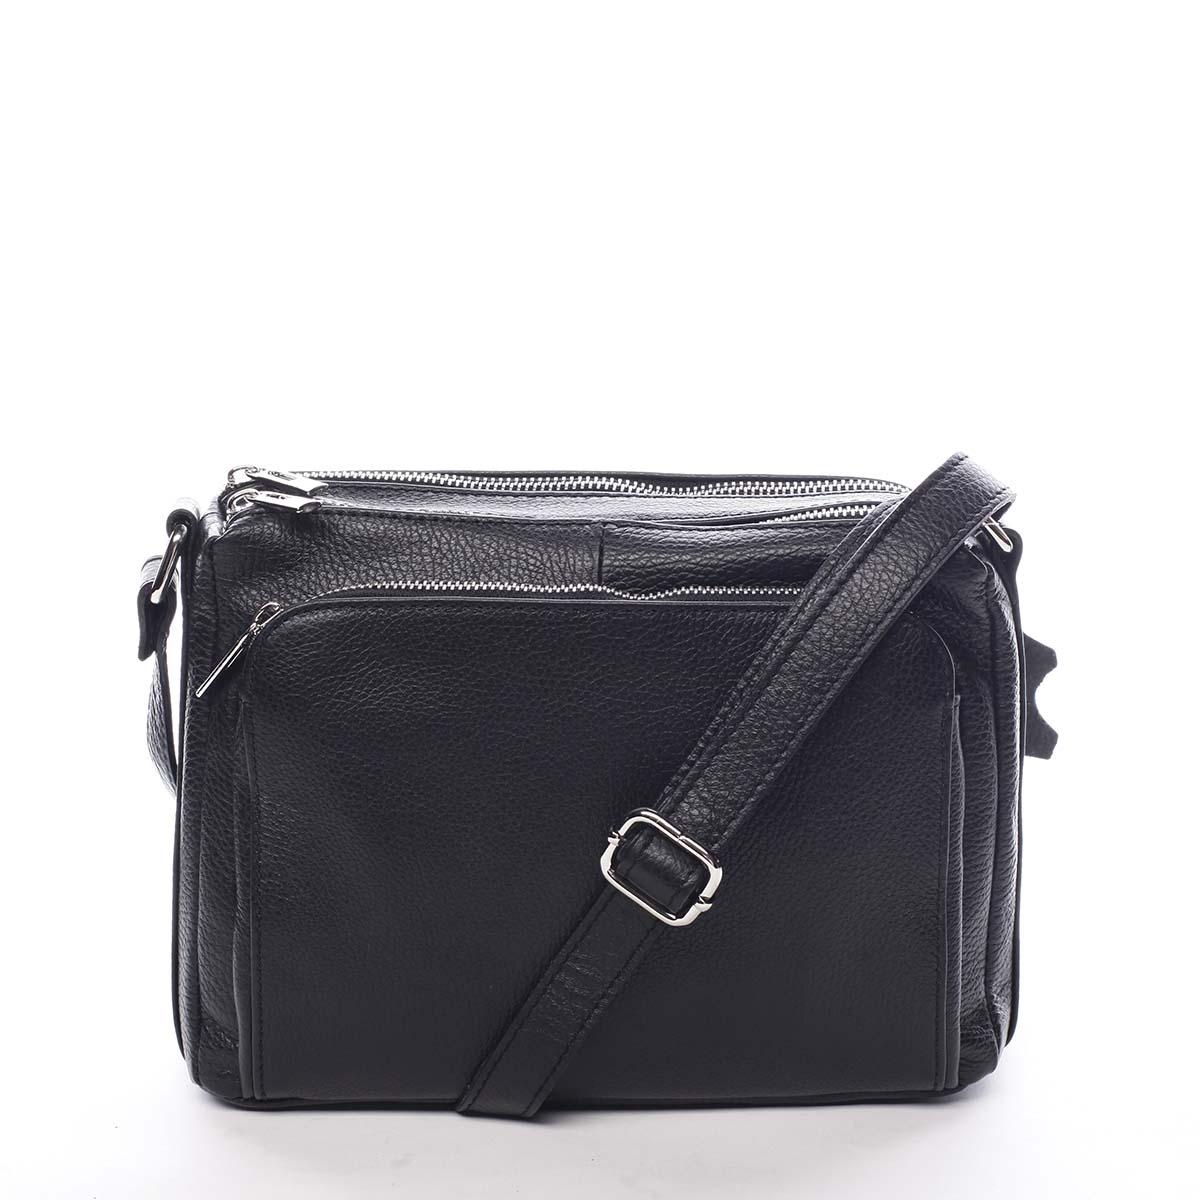 Dámska kožená crossbody kabelka čierna - ItalY Bandit čierna